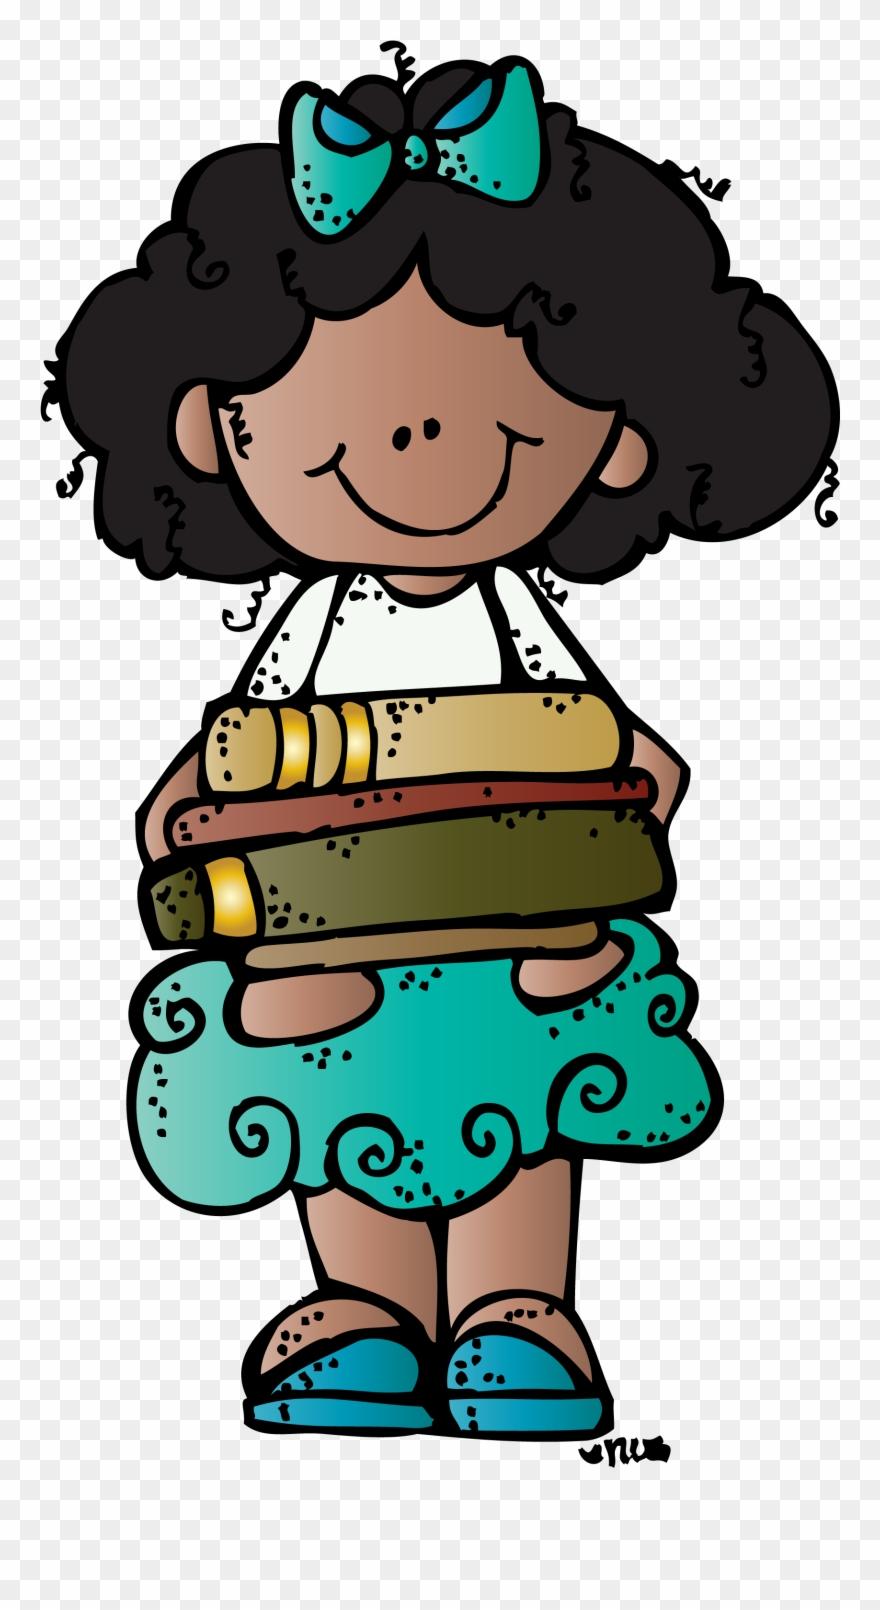 Back to school clipart melonheadz freeuse stock Here You Can See The School Clipart Melonheadz Collection ... freeuse stock